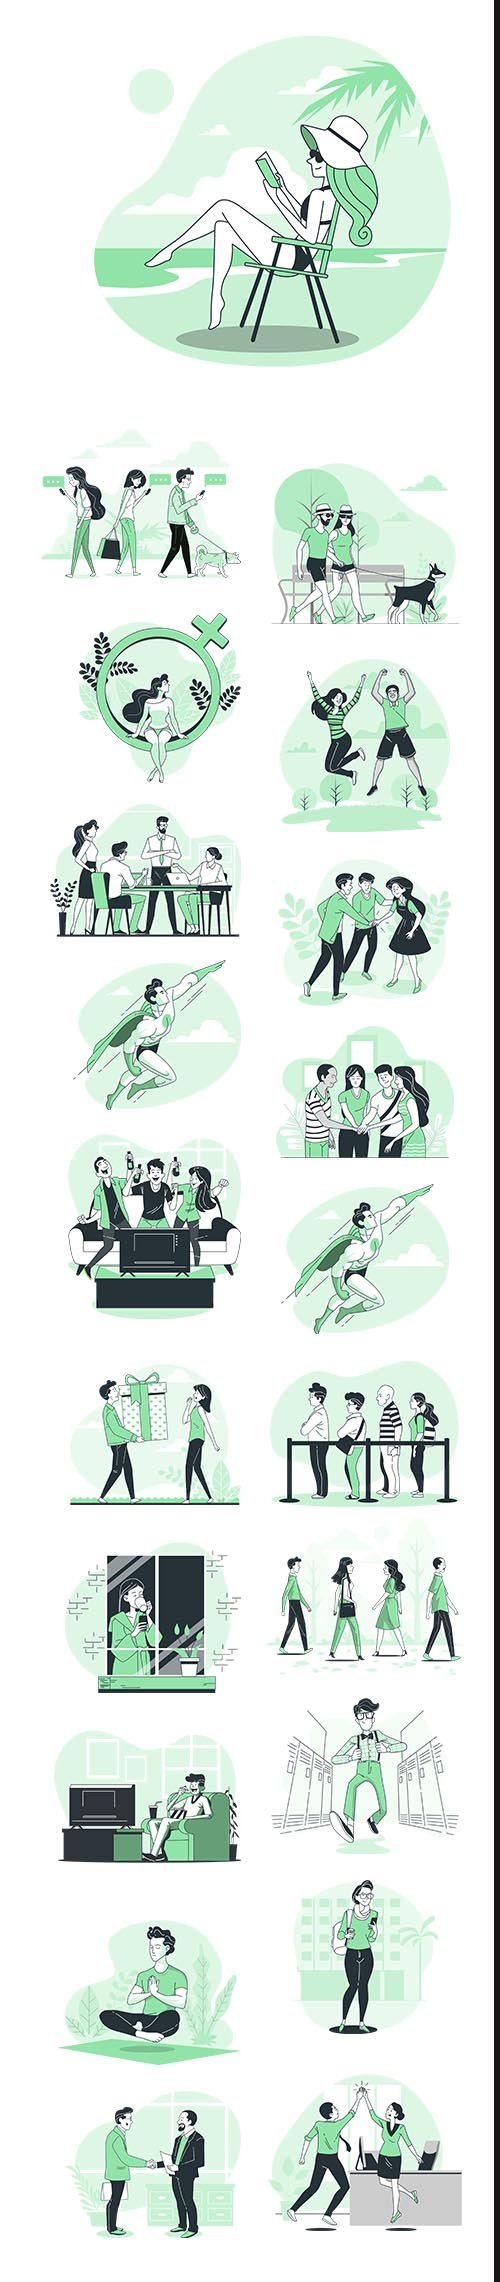 Vector Green Illustrations People Concept Vol 4